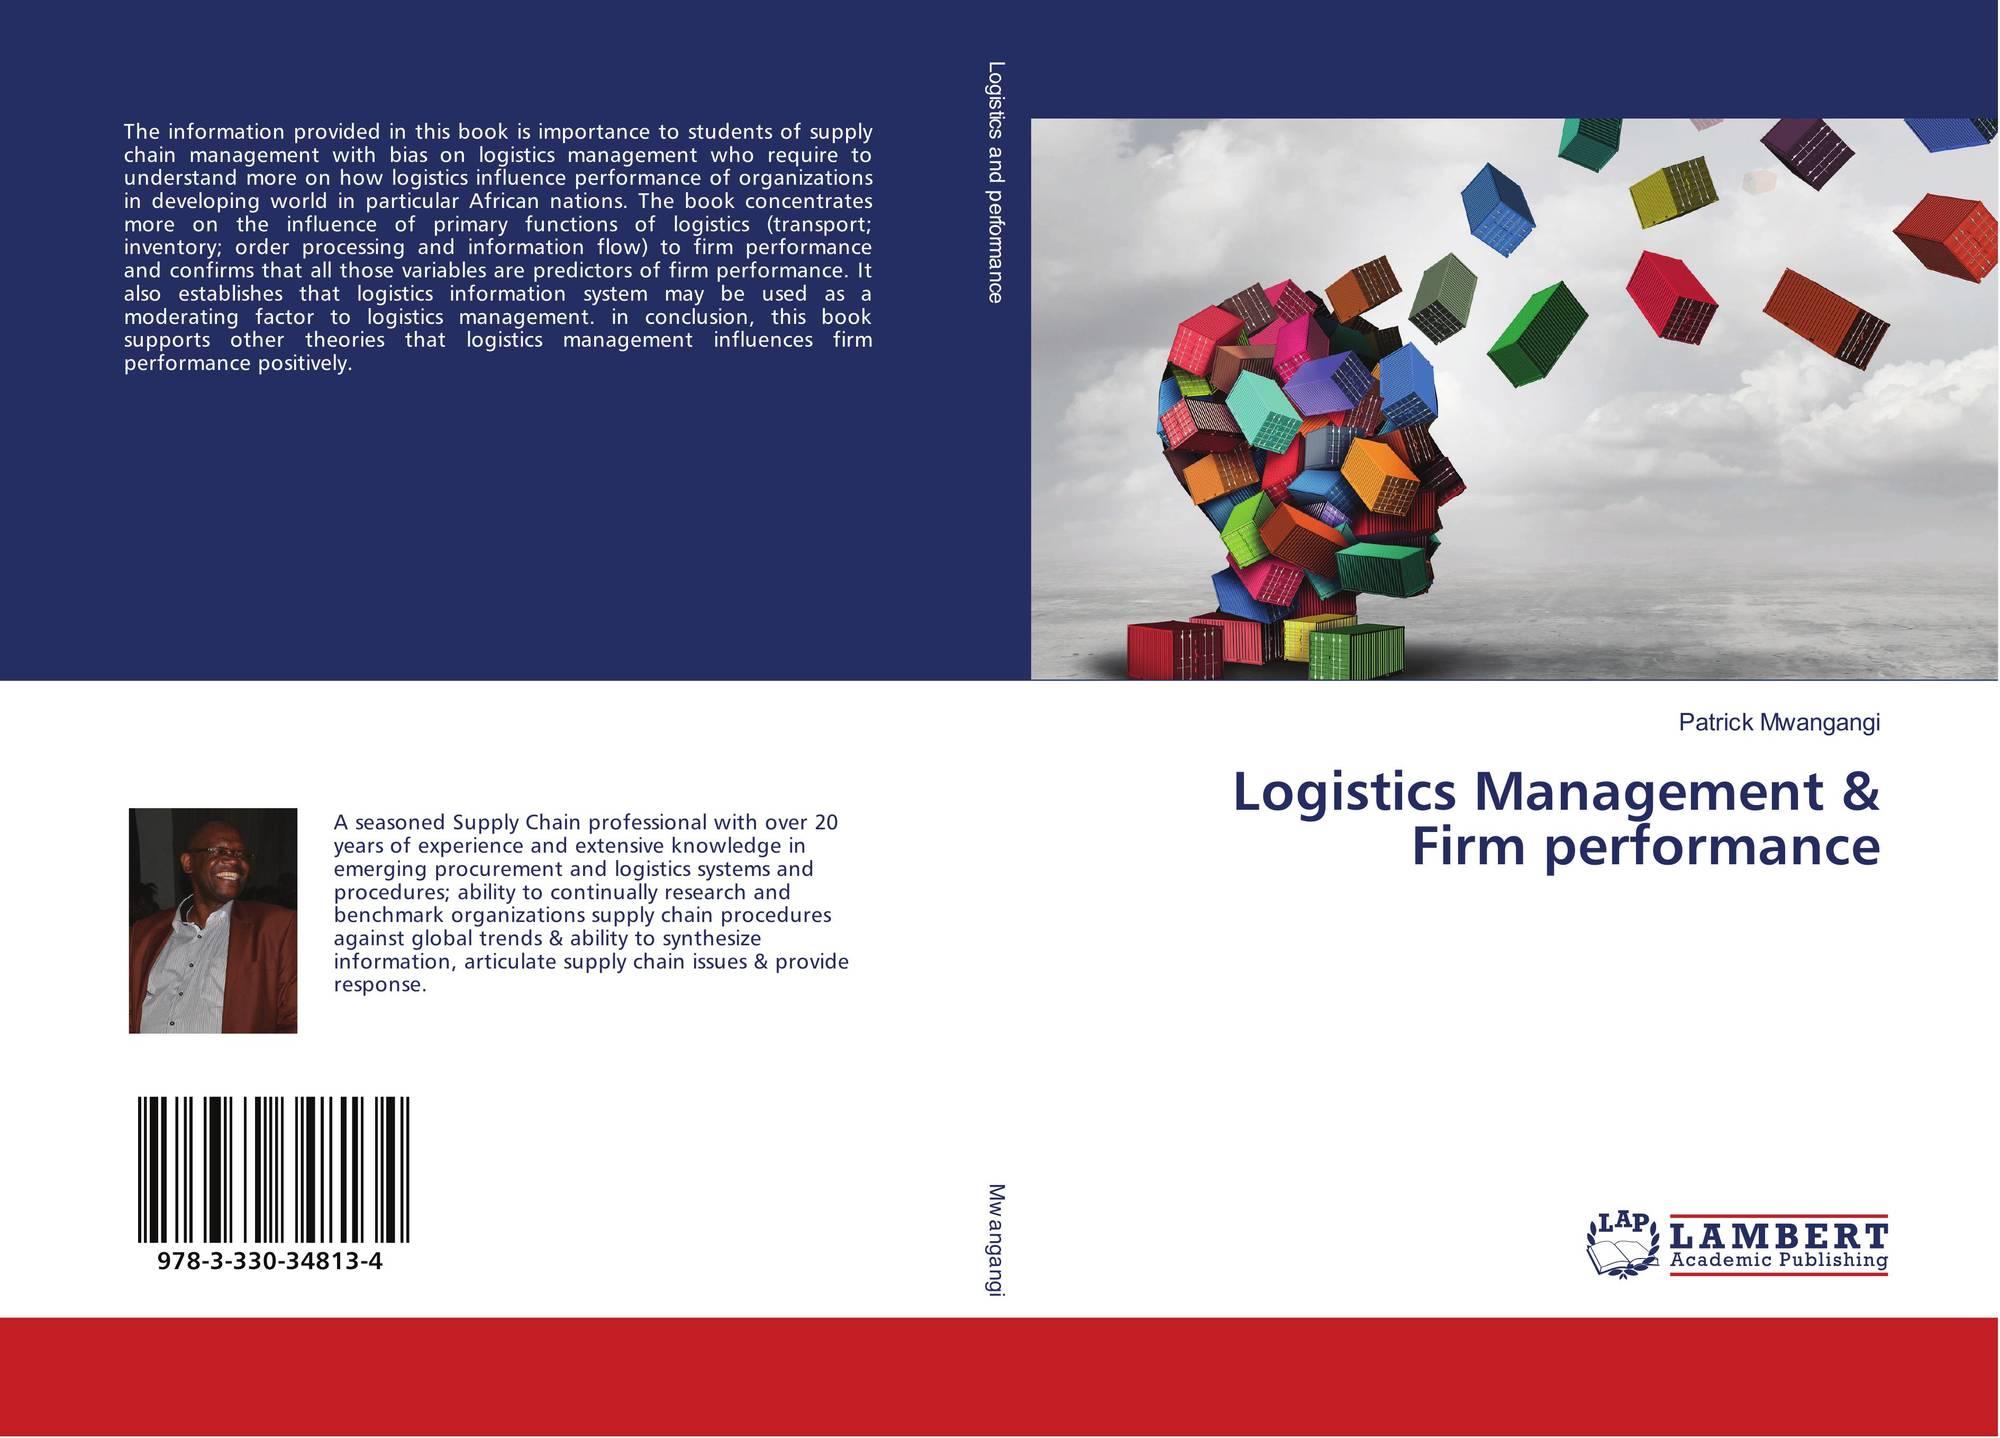 Logistics Management & Firm performance, 978-3-330-34813-4